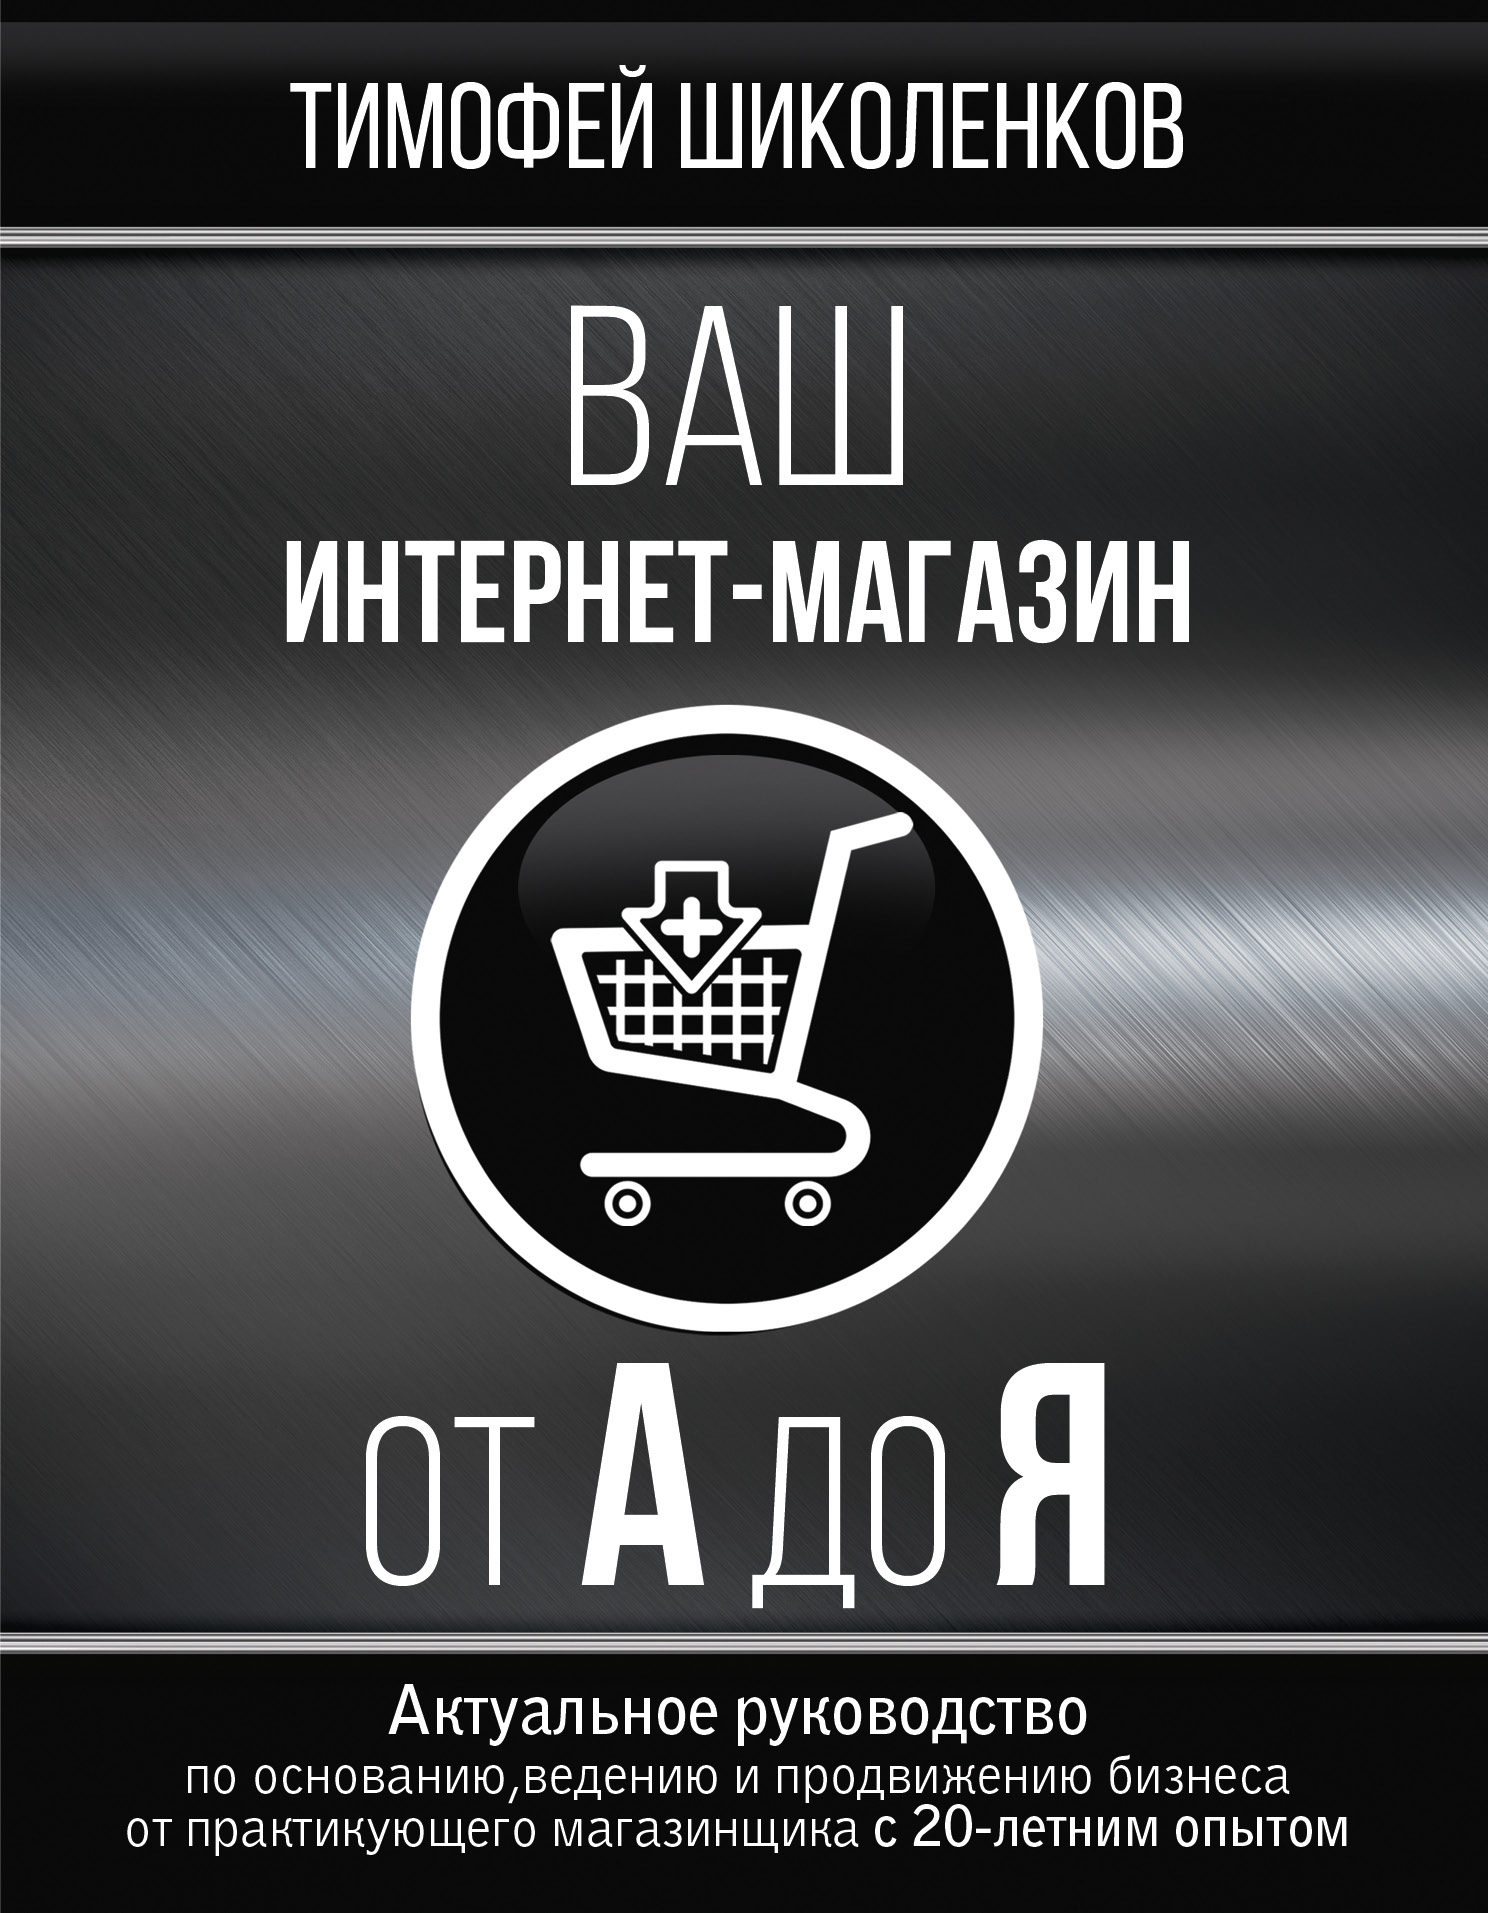 Ваш интернет-магазин от А до Я ( Шиколенков Тимофей Александрович  )